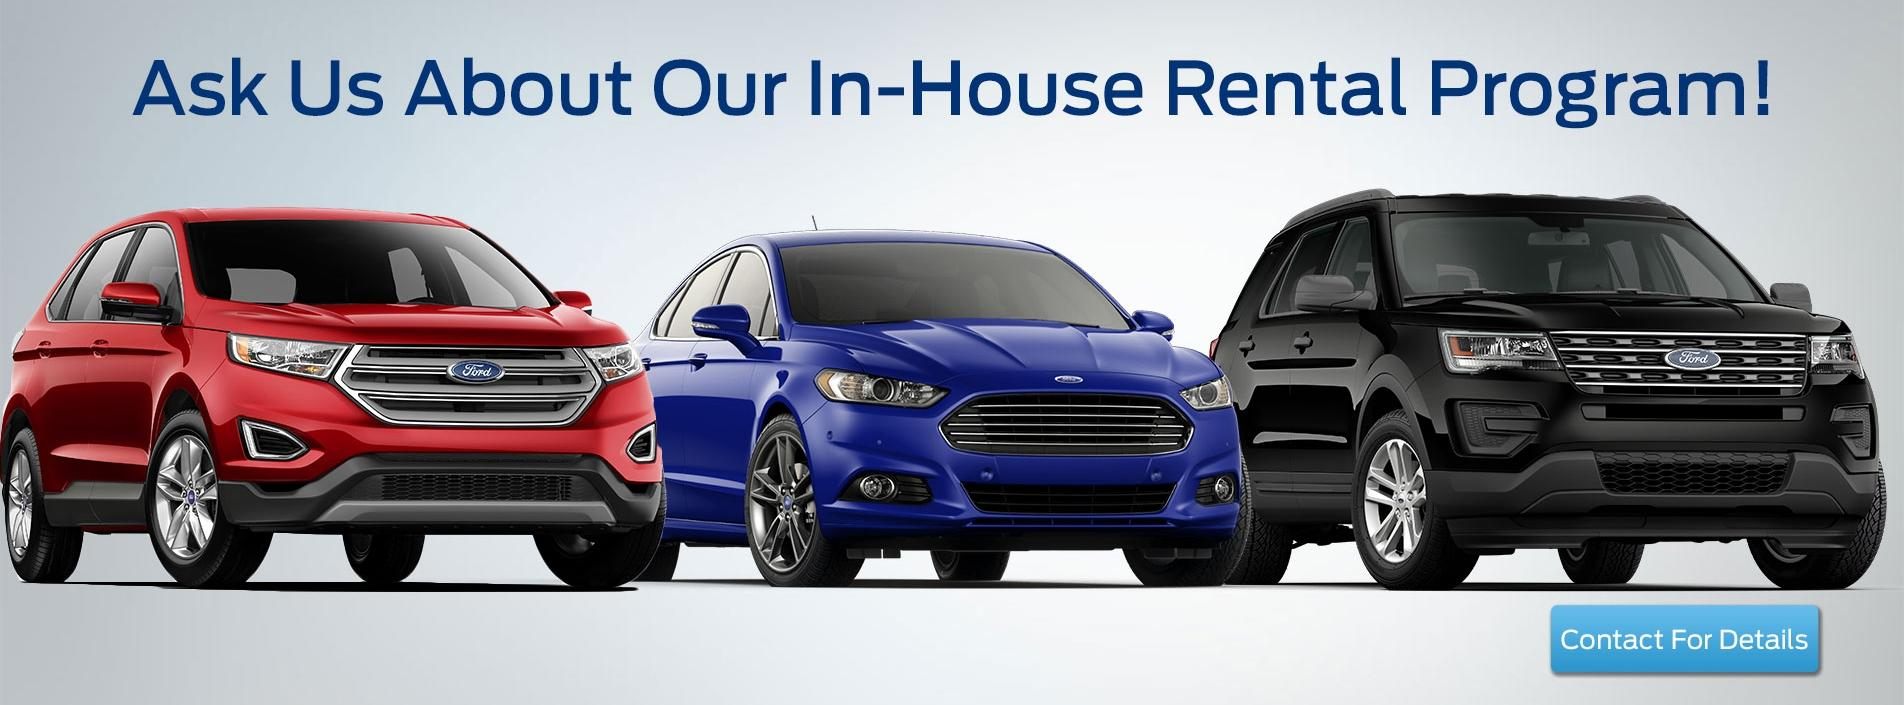 In house rental program regal motors dealer regal motors sales in house rental program regal motors dealer regal motors sales service malvernweather Choice Image